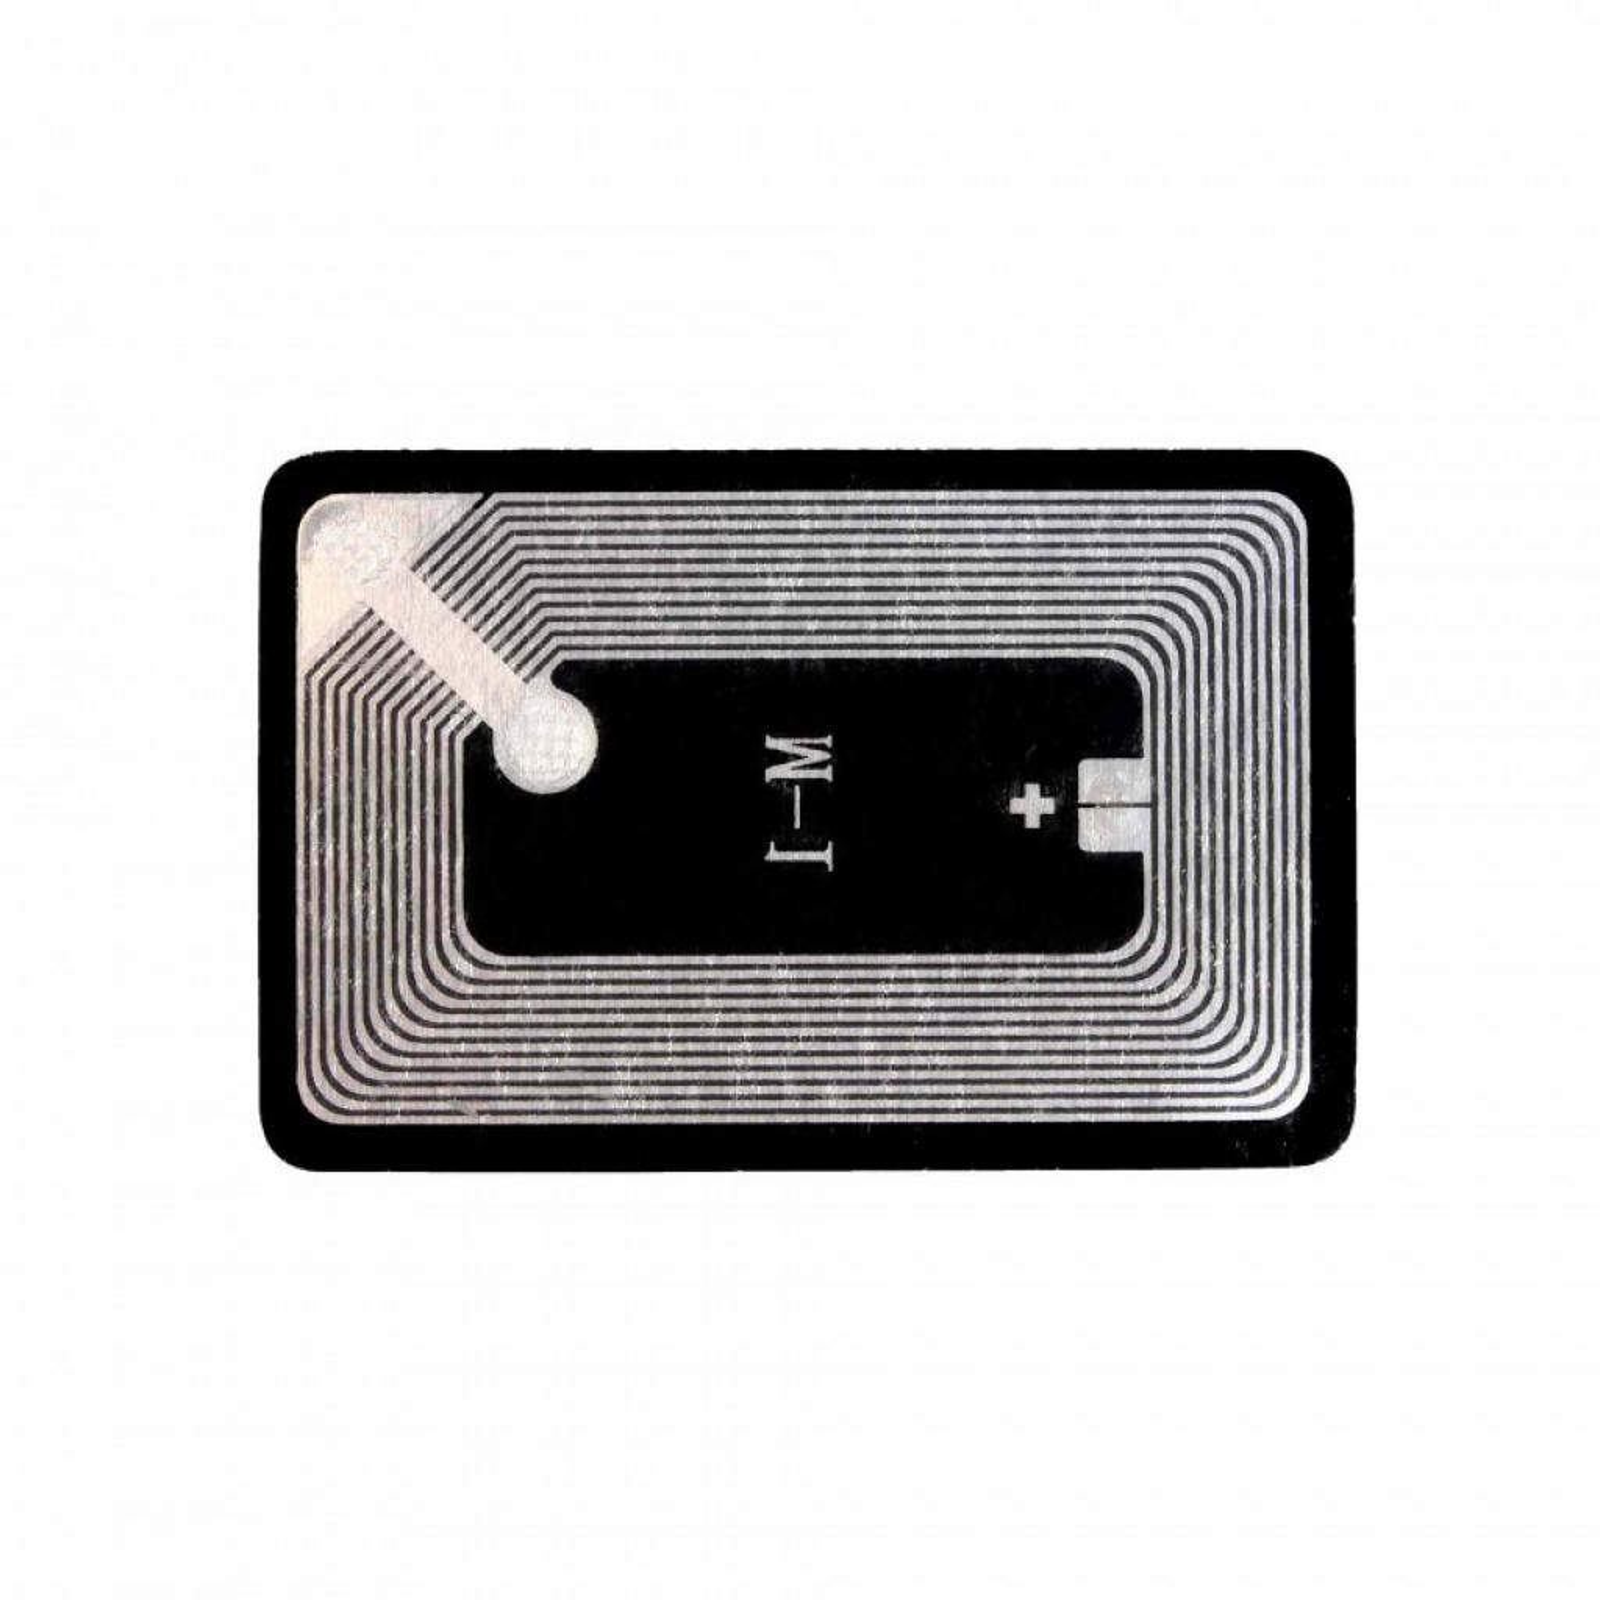 Чип для картриджа Kyocera TK-360 (EU/MEA) 20k Static Control (TK360CHIP-EU)